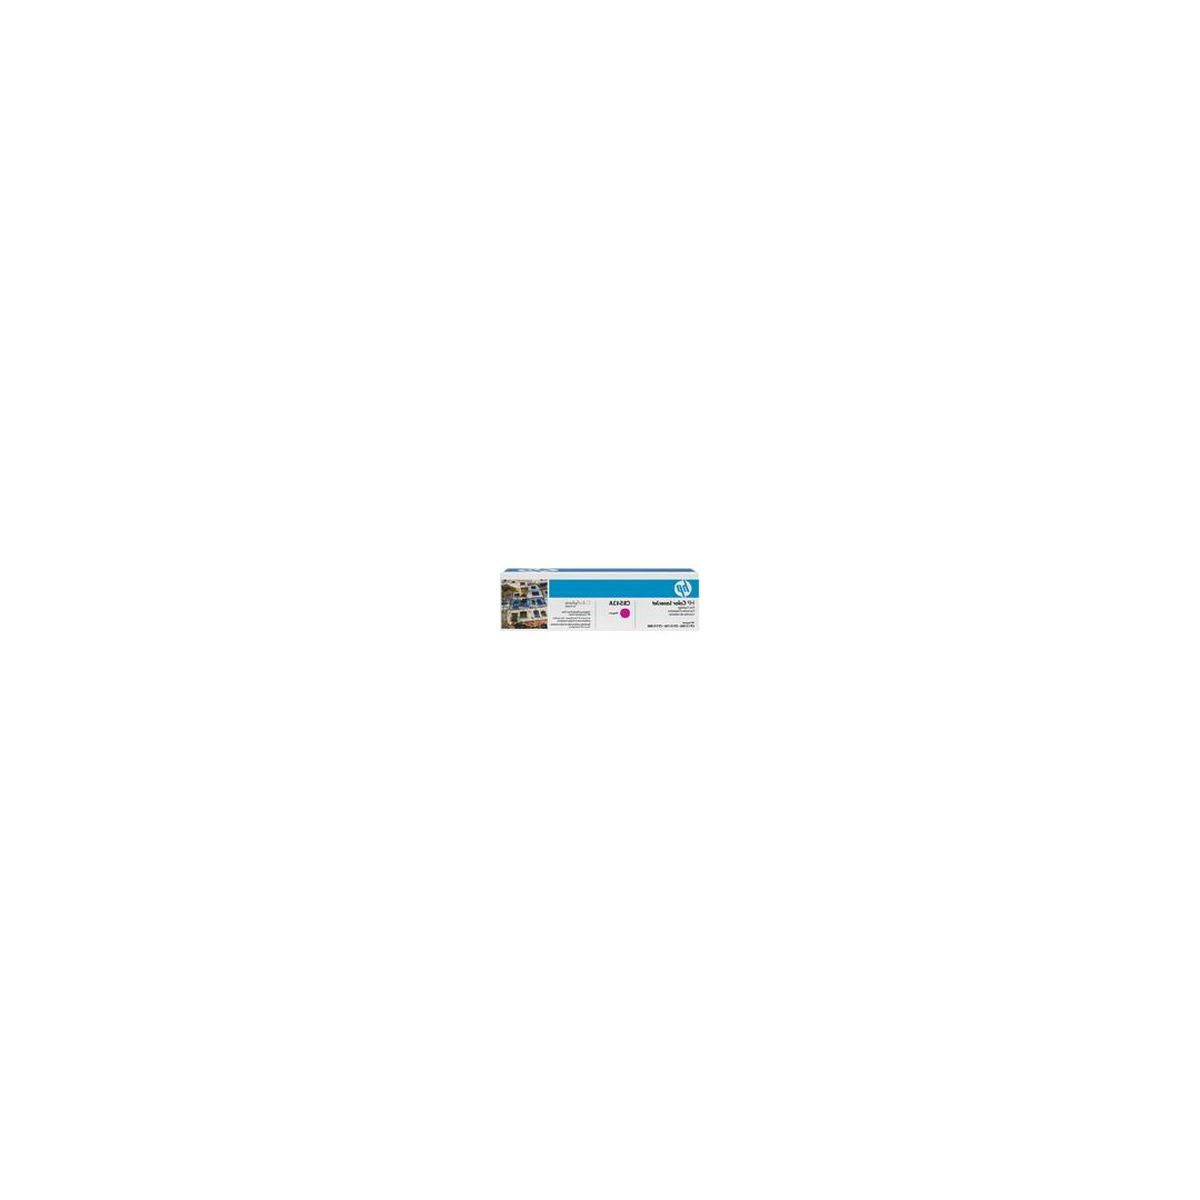 Toner hp cb543a magenta - 2% de remise imm�diate avec le code : deal2